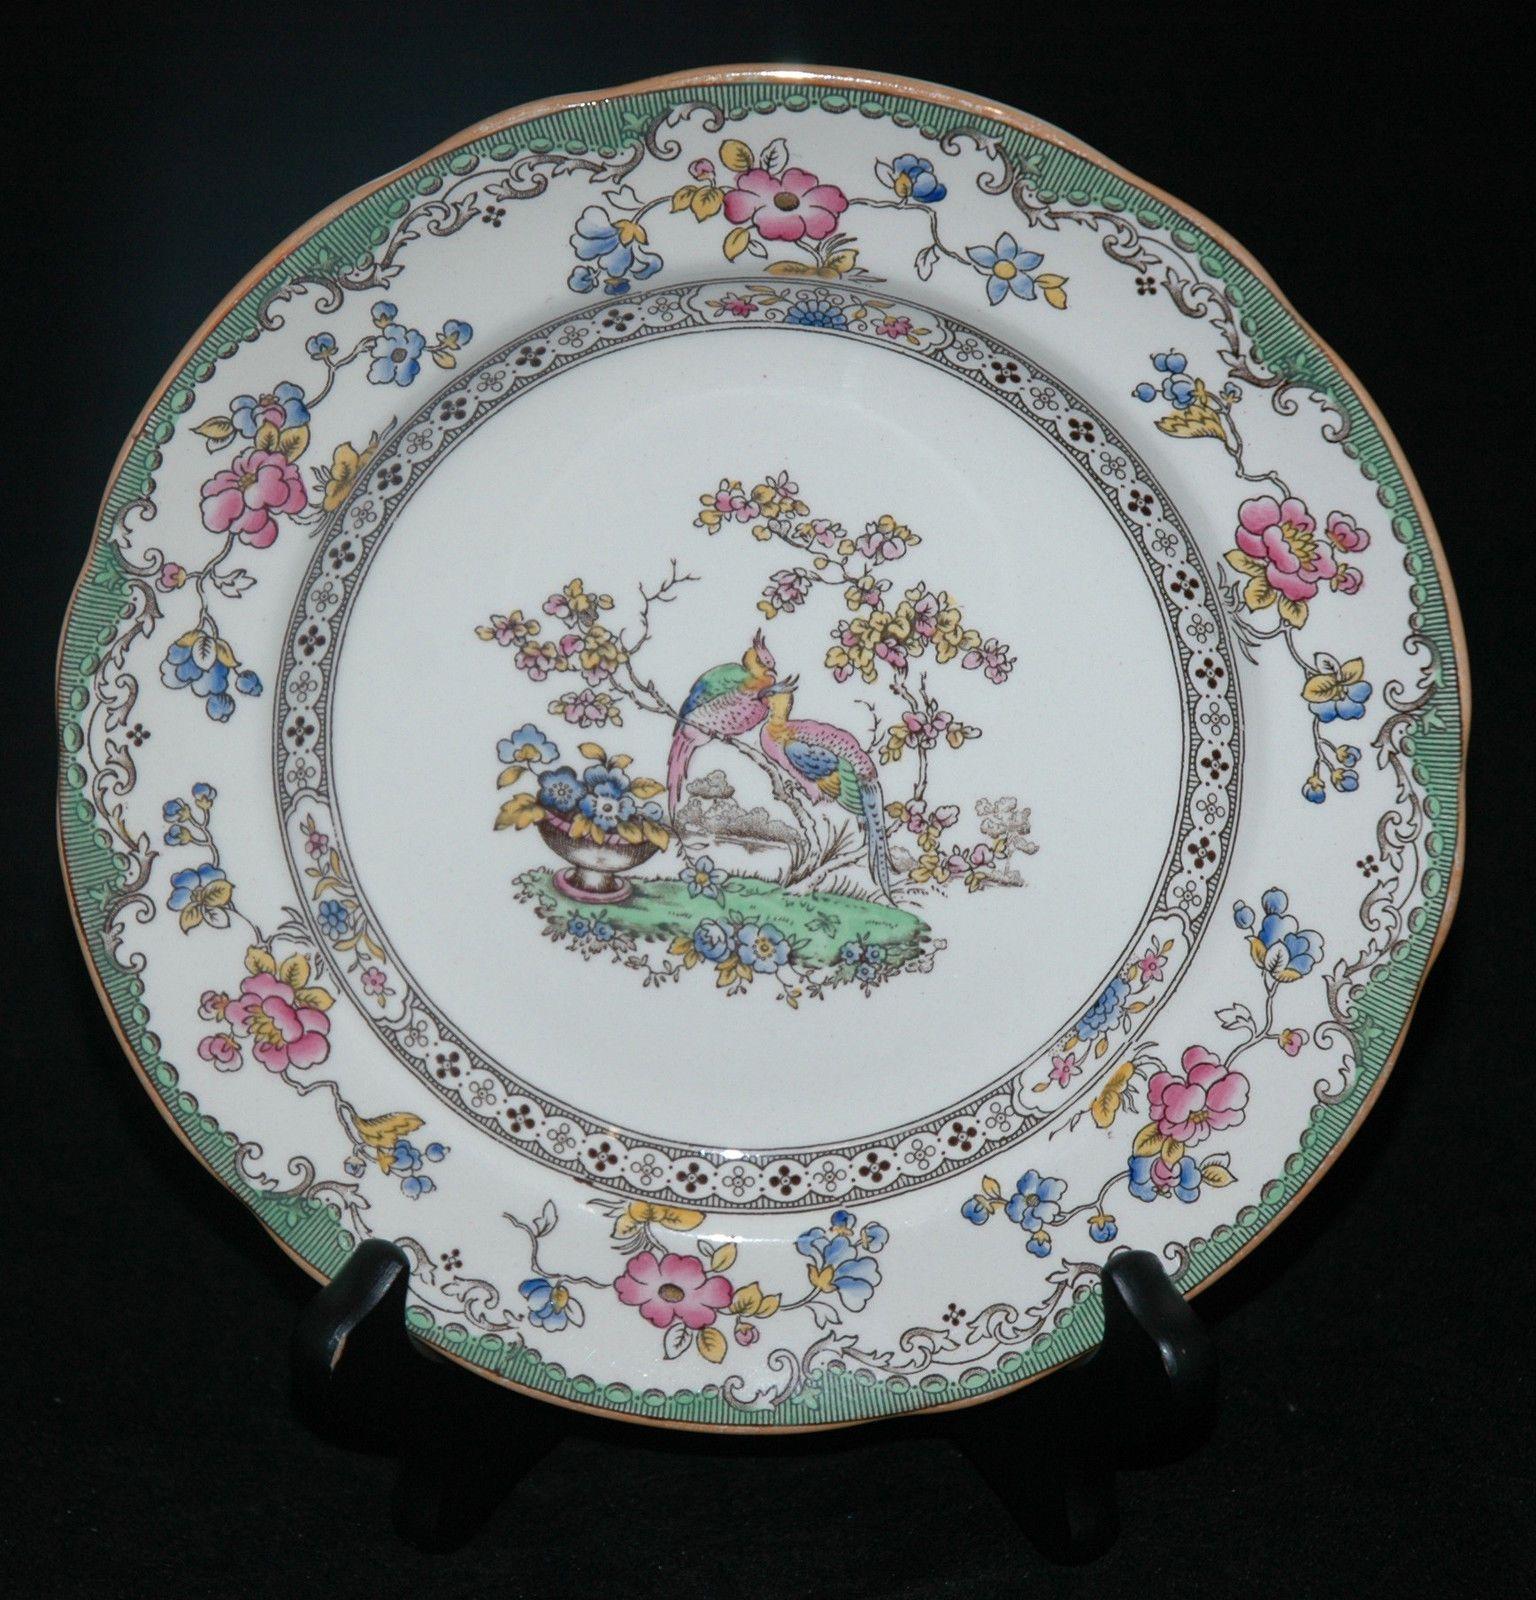 Details Copeland Spode China Bread & Butter Plate